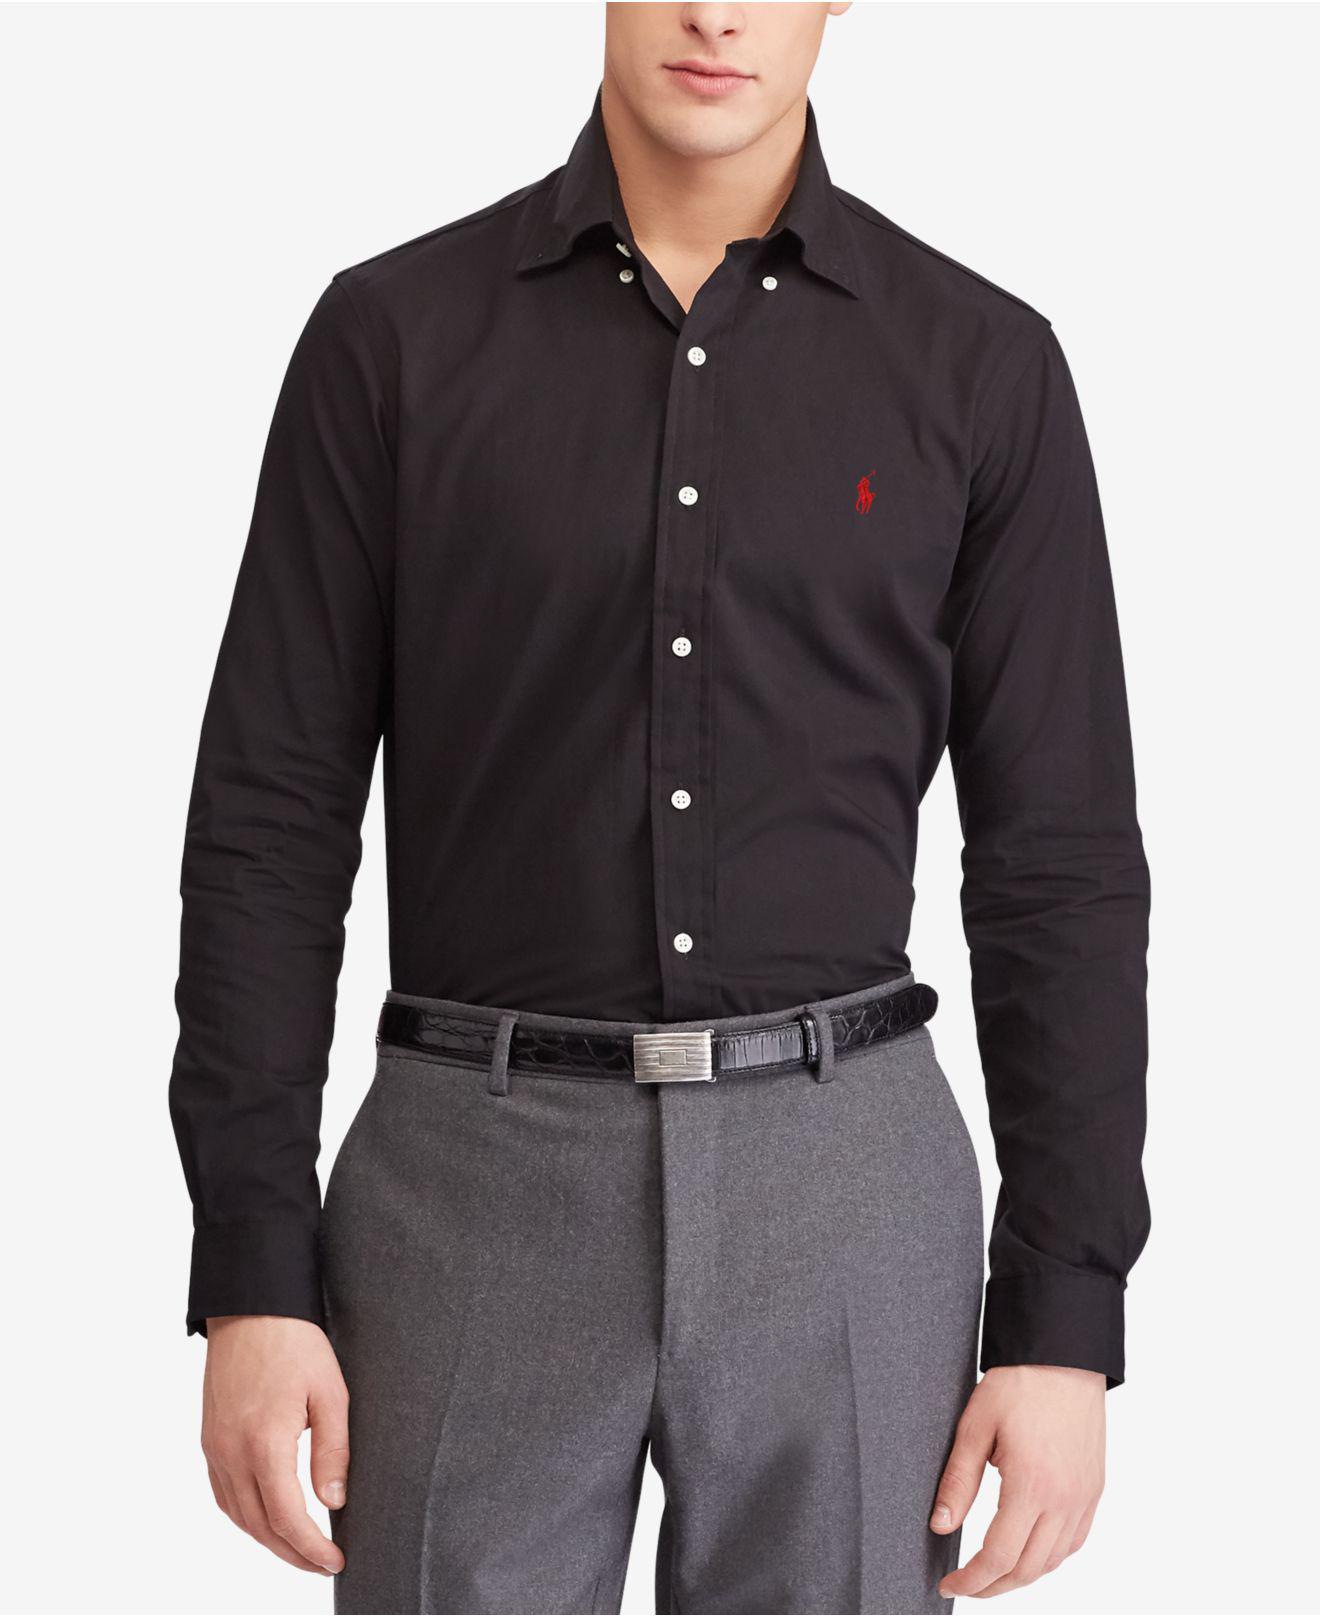 0555b18a8 Polo Ralph Lauren Slim Fit Poplin Shirt in Black for Men - Lyst